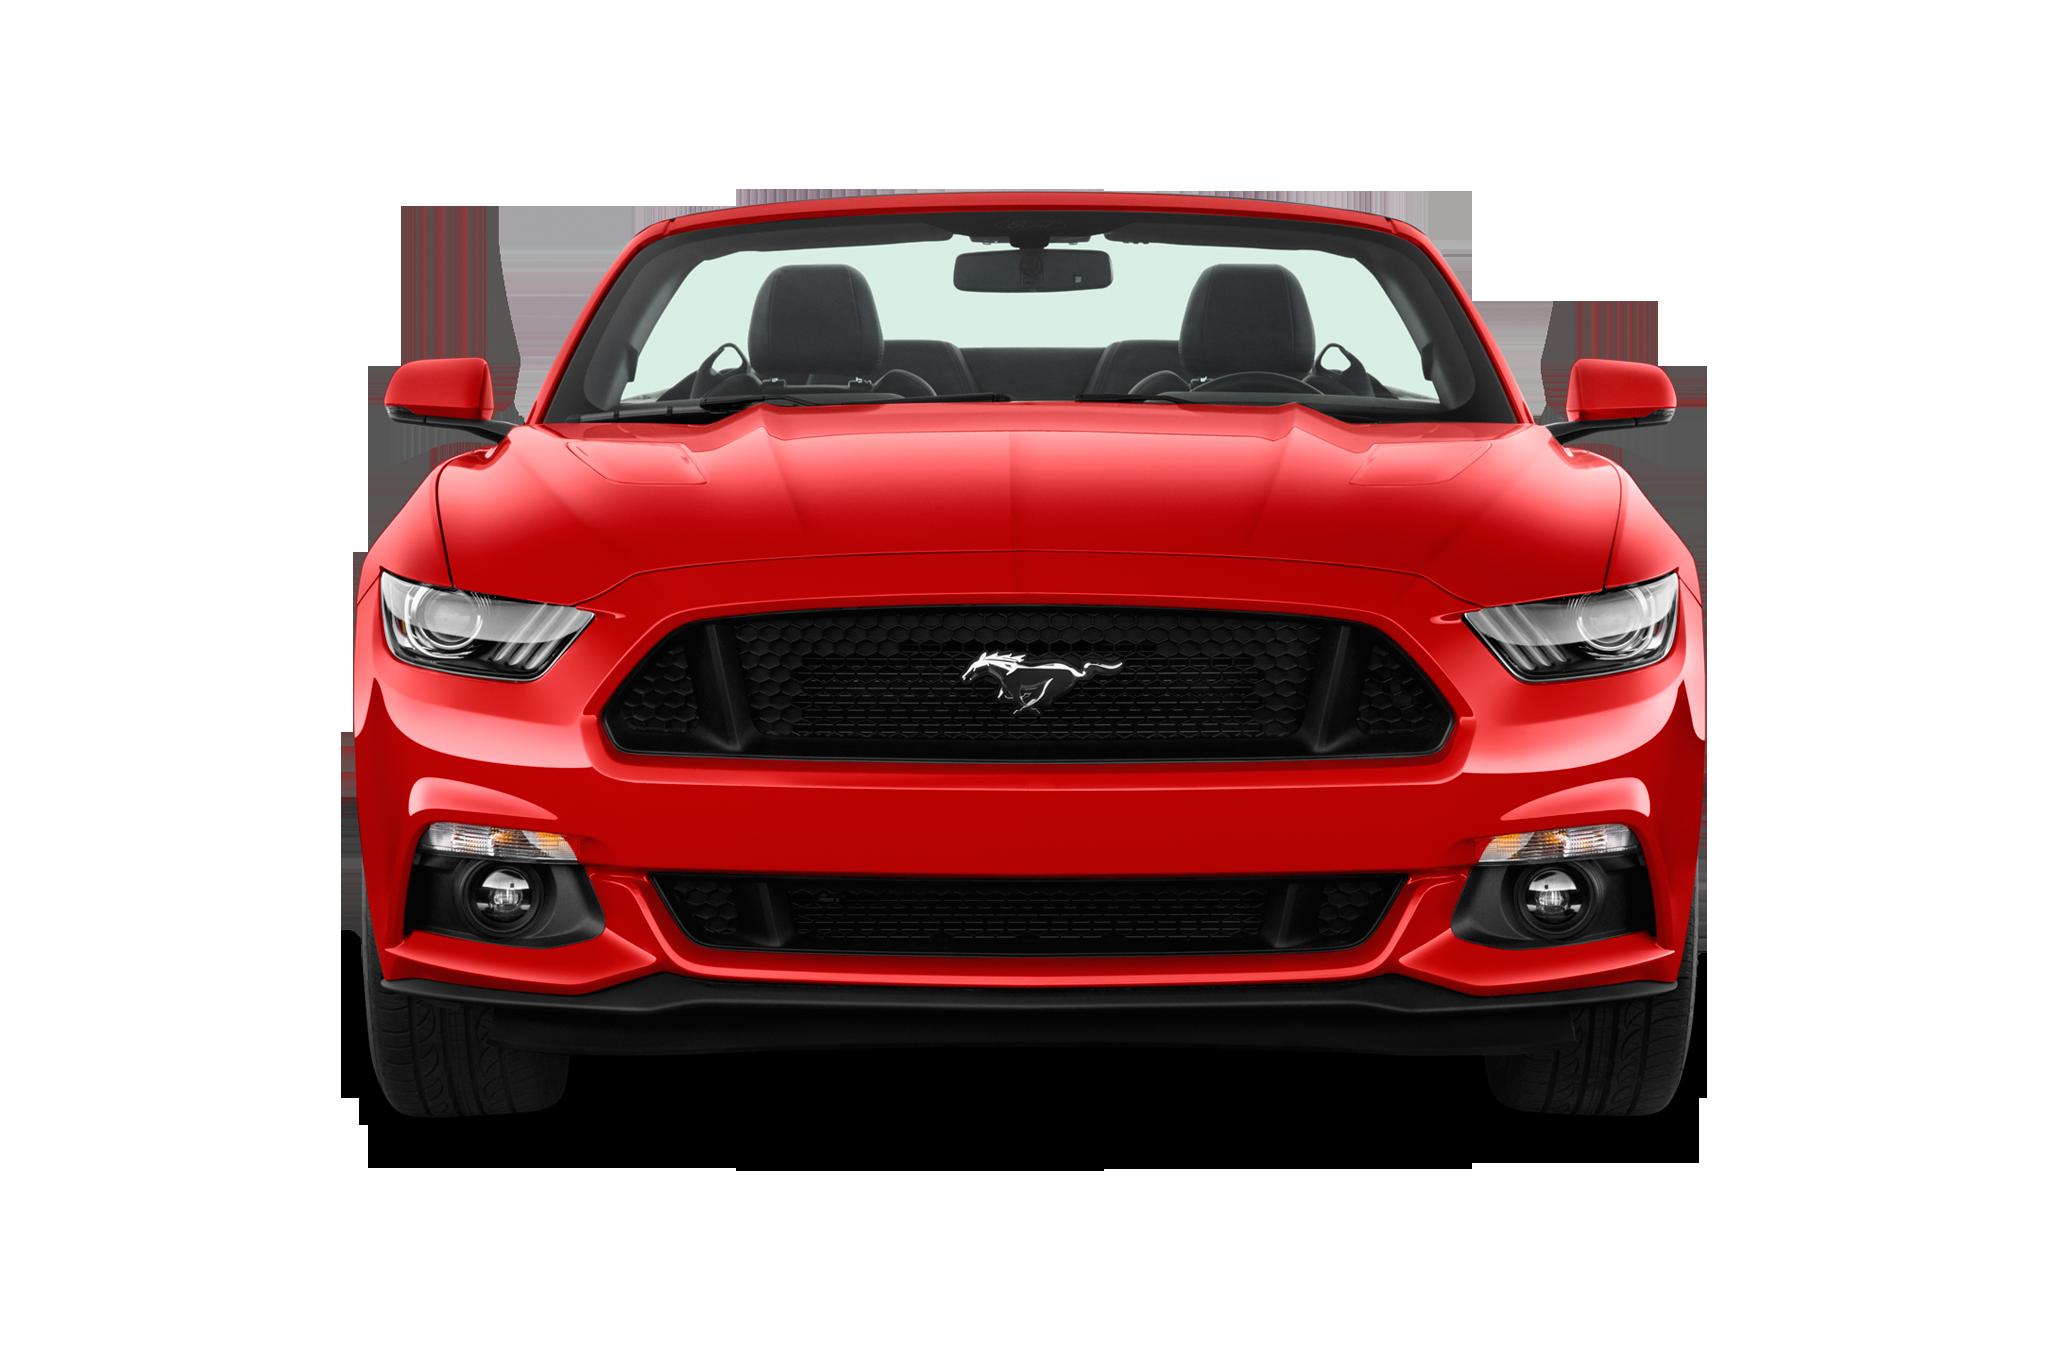 Ford Mustang Png Image Ford Mustang 2015 Ford Mustang Mustang